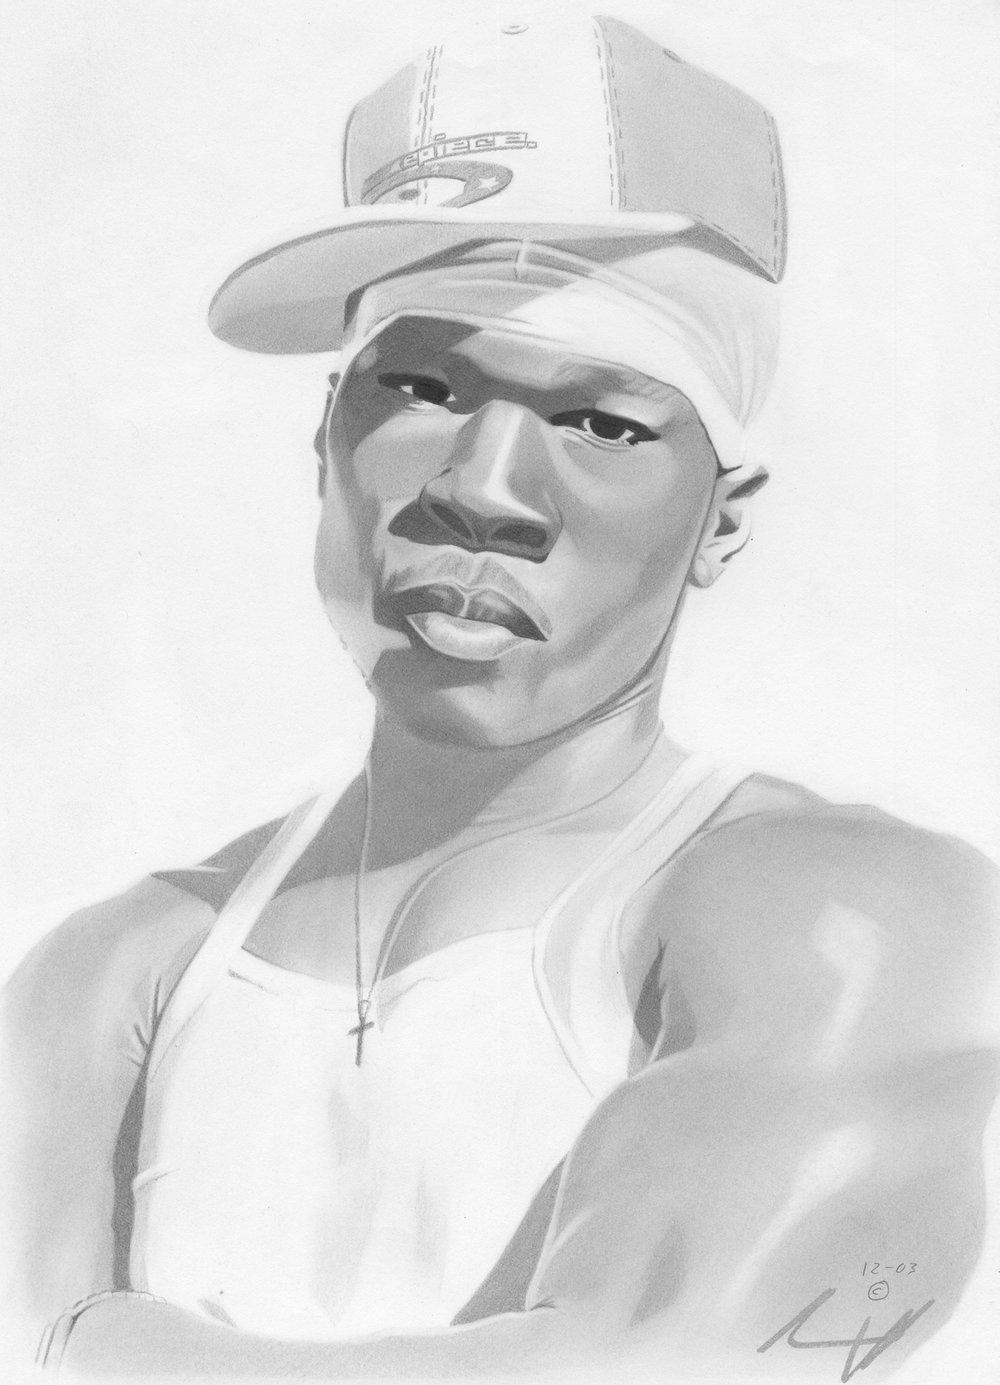 2003-12 50 Cent.jpg